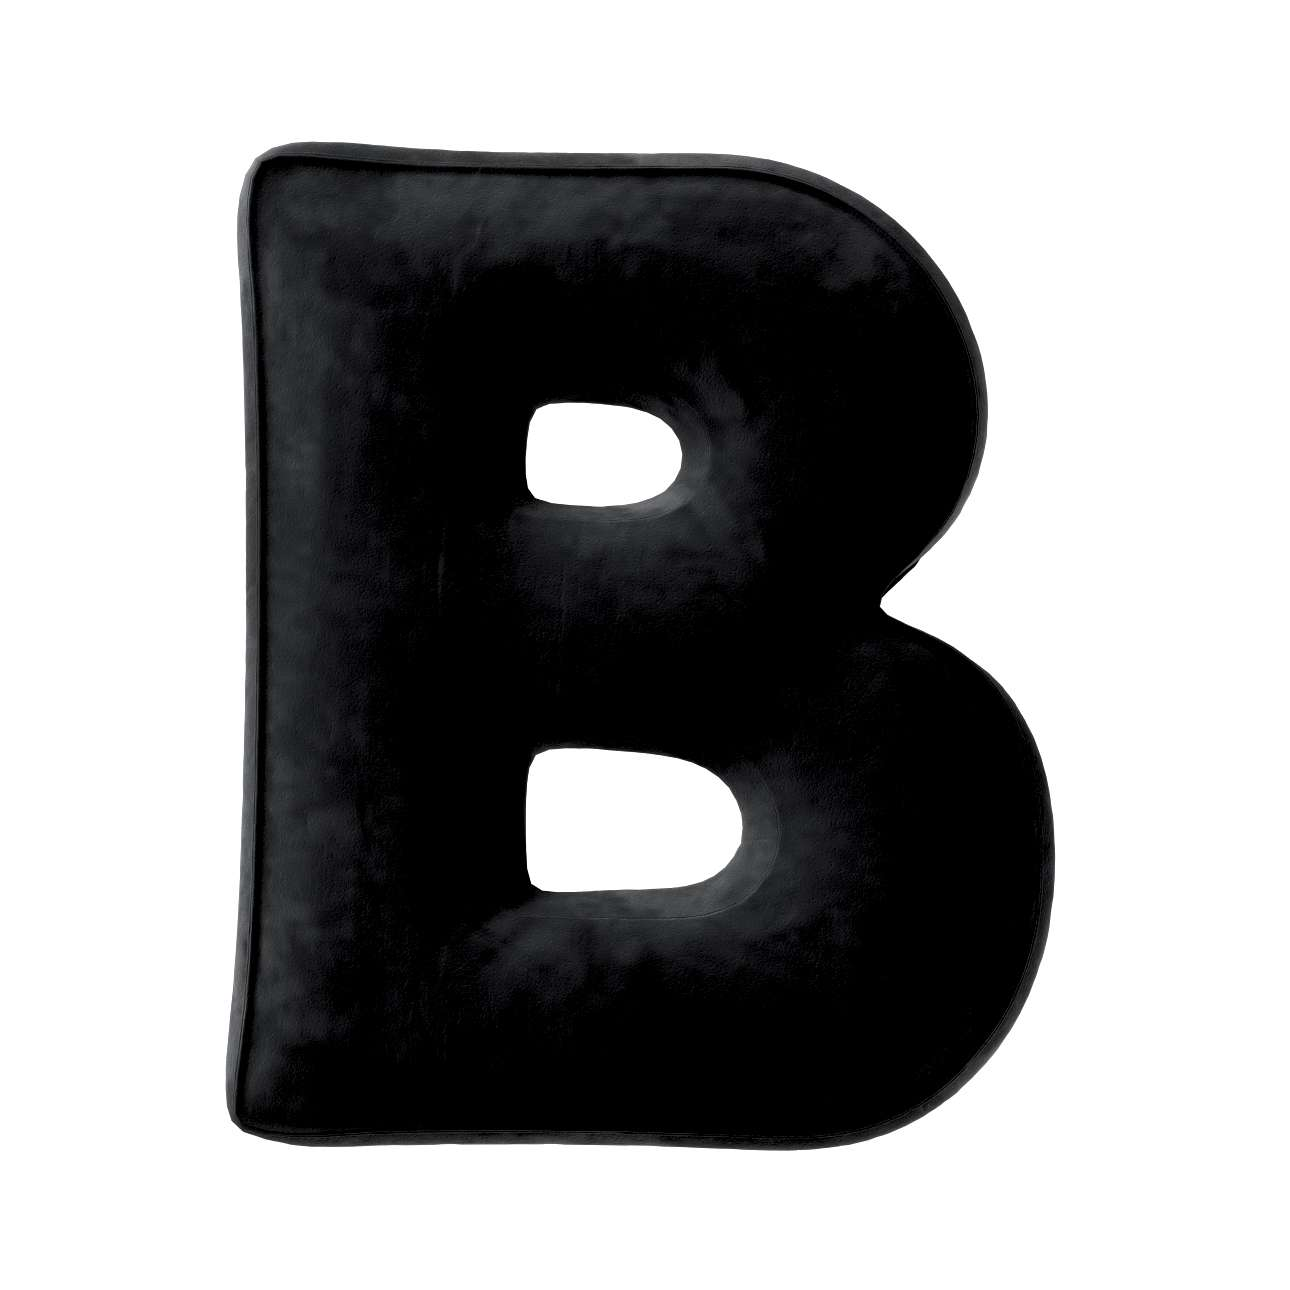 Polštář písmenko B v kolekci Posh Velvet, látka: 704-17